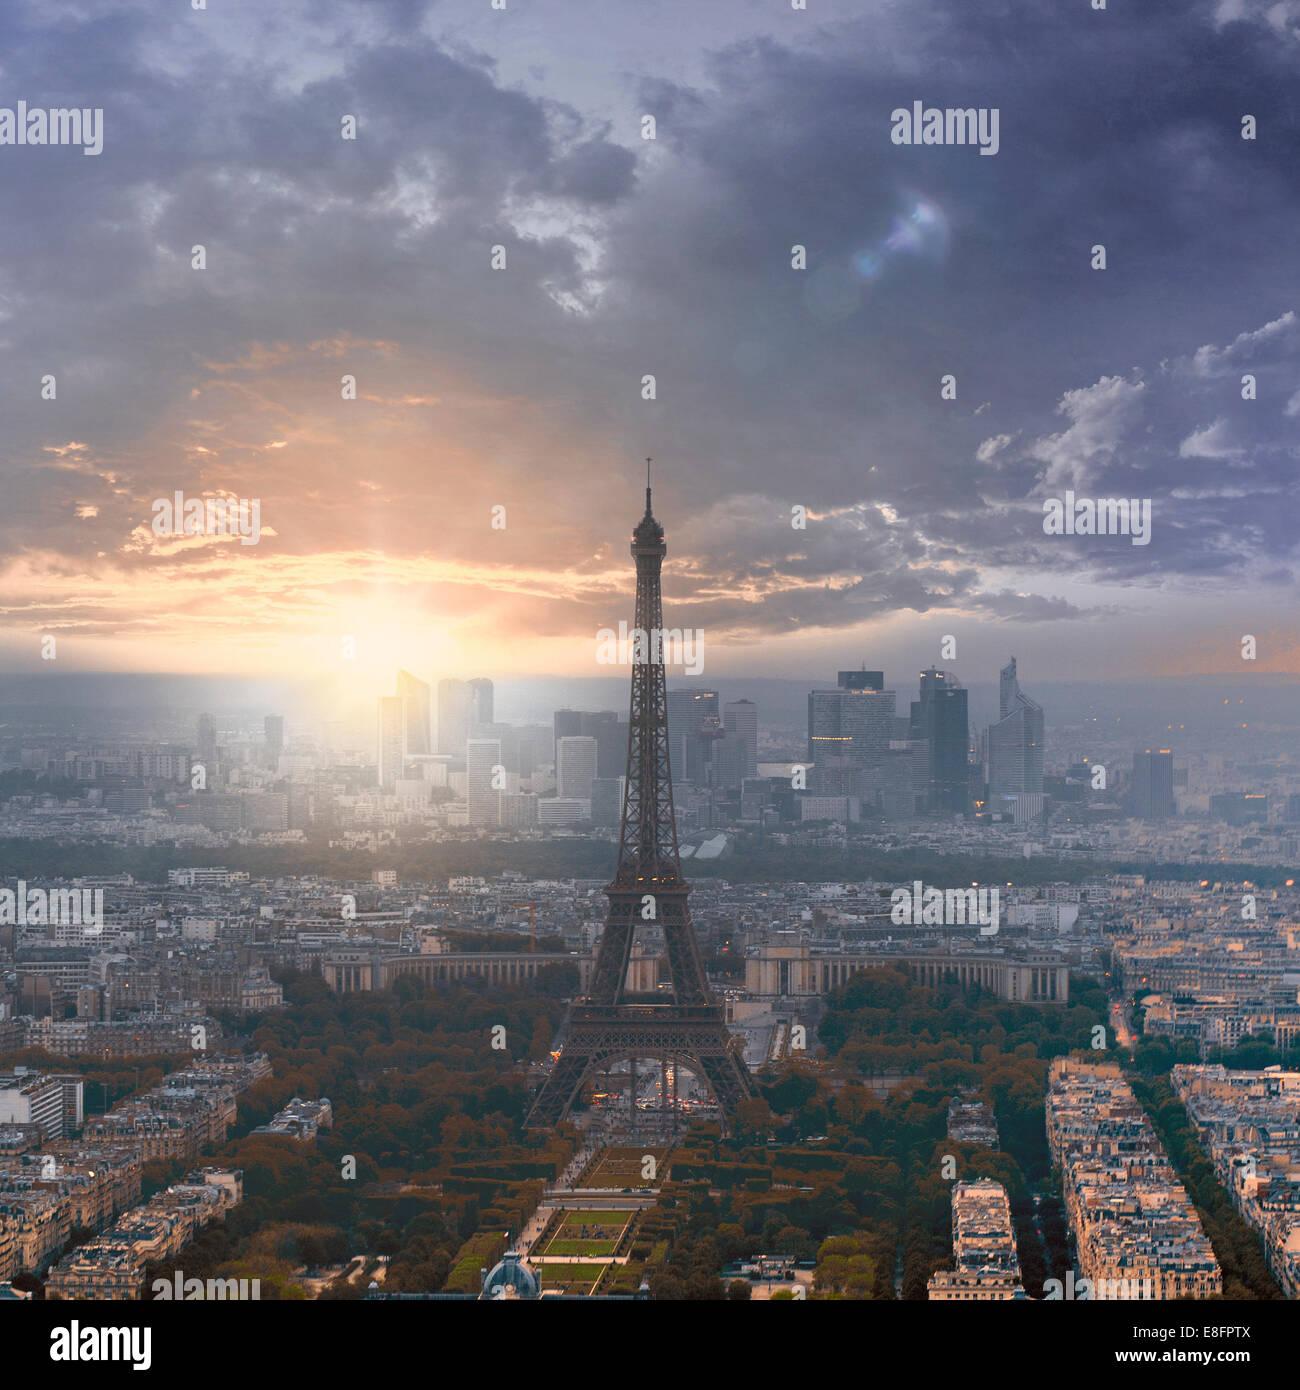 France, Paris, Eiffel Tower - Stock Image